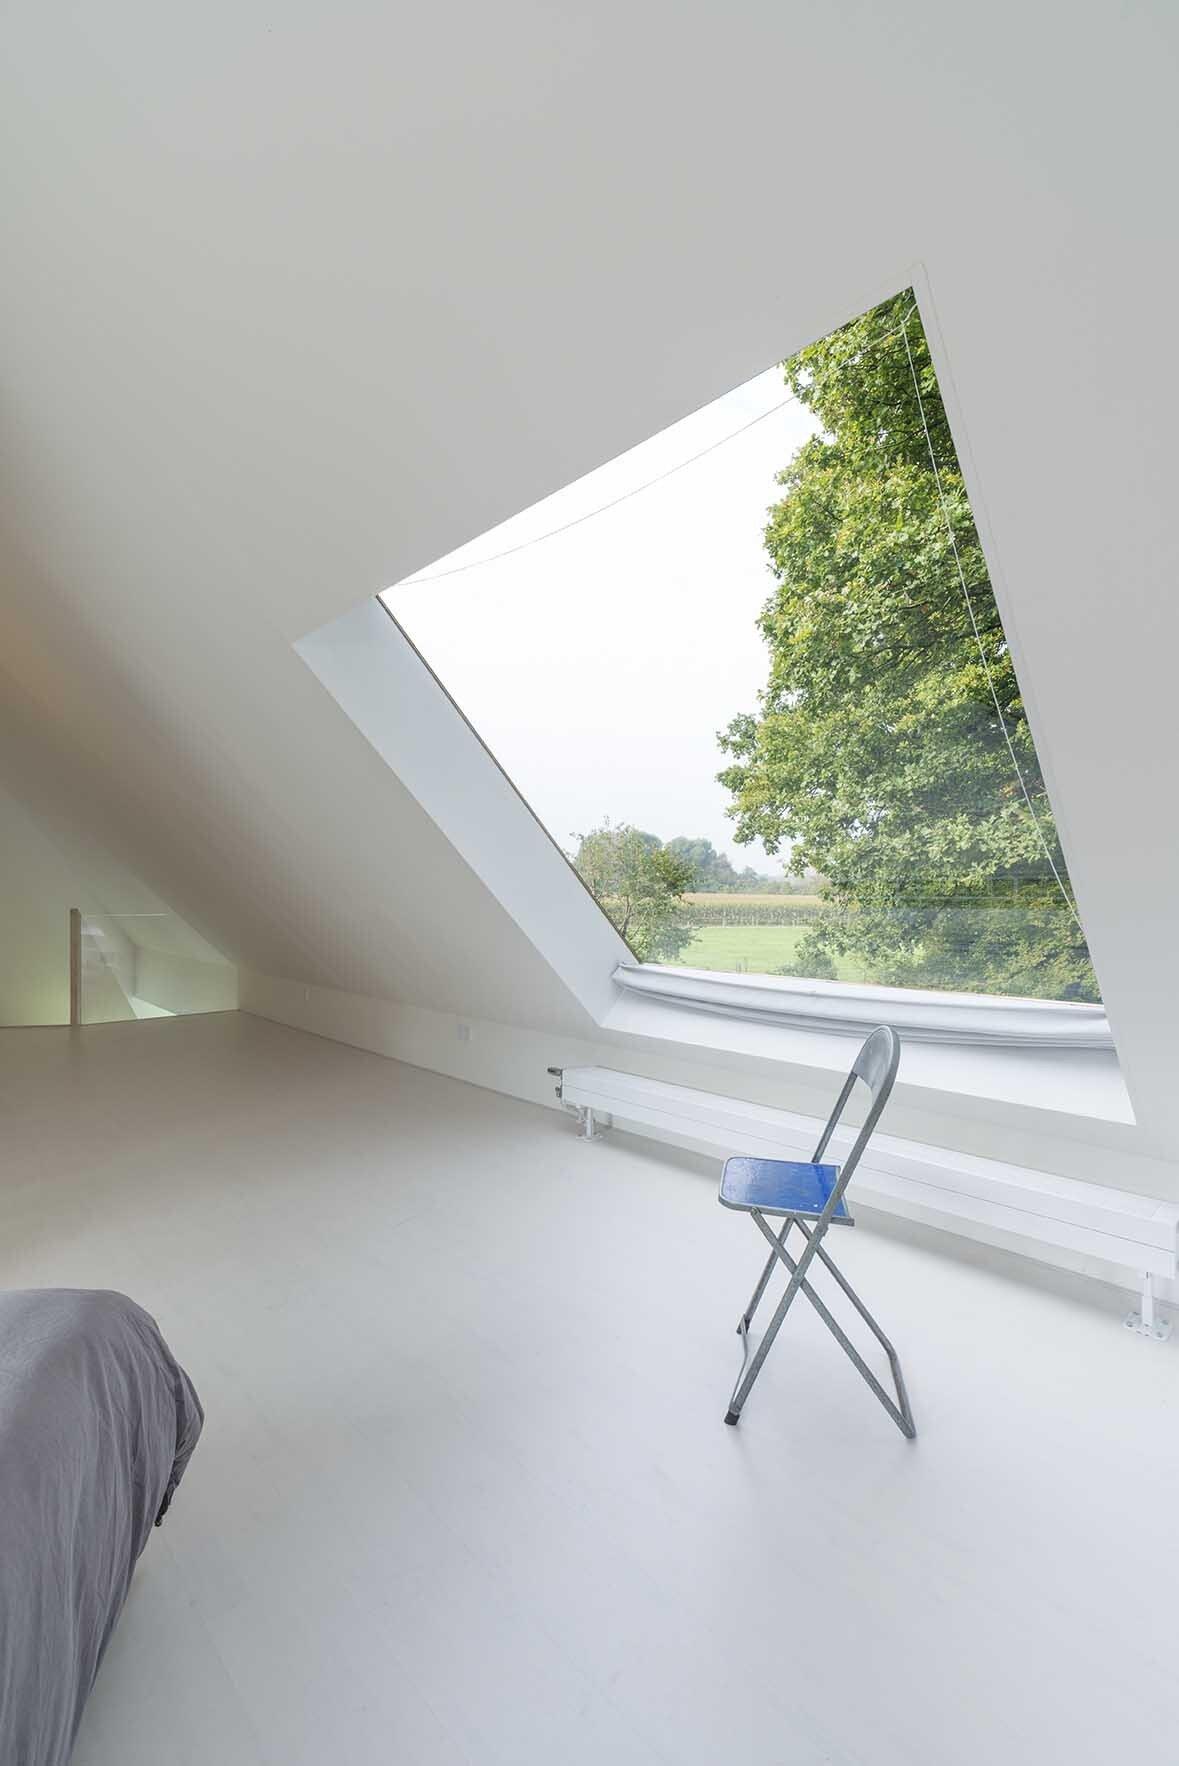 House in Almen - Barend Koolhaas - The Netherlands - Bedroom Skylight - Humble Homes